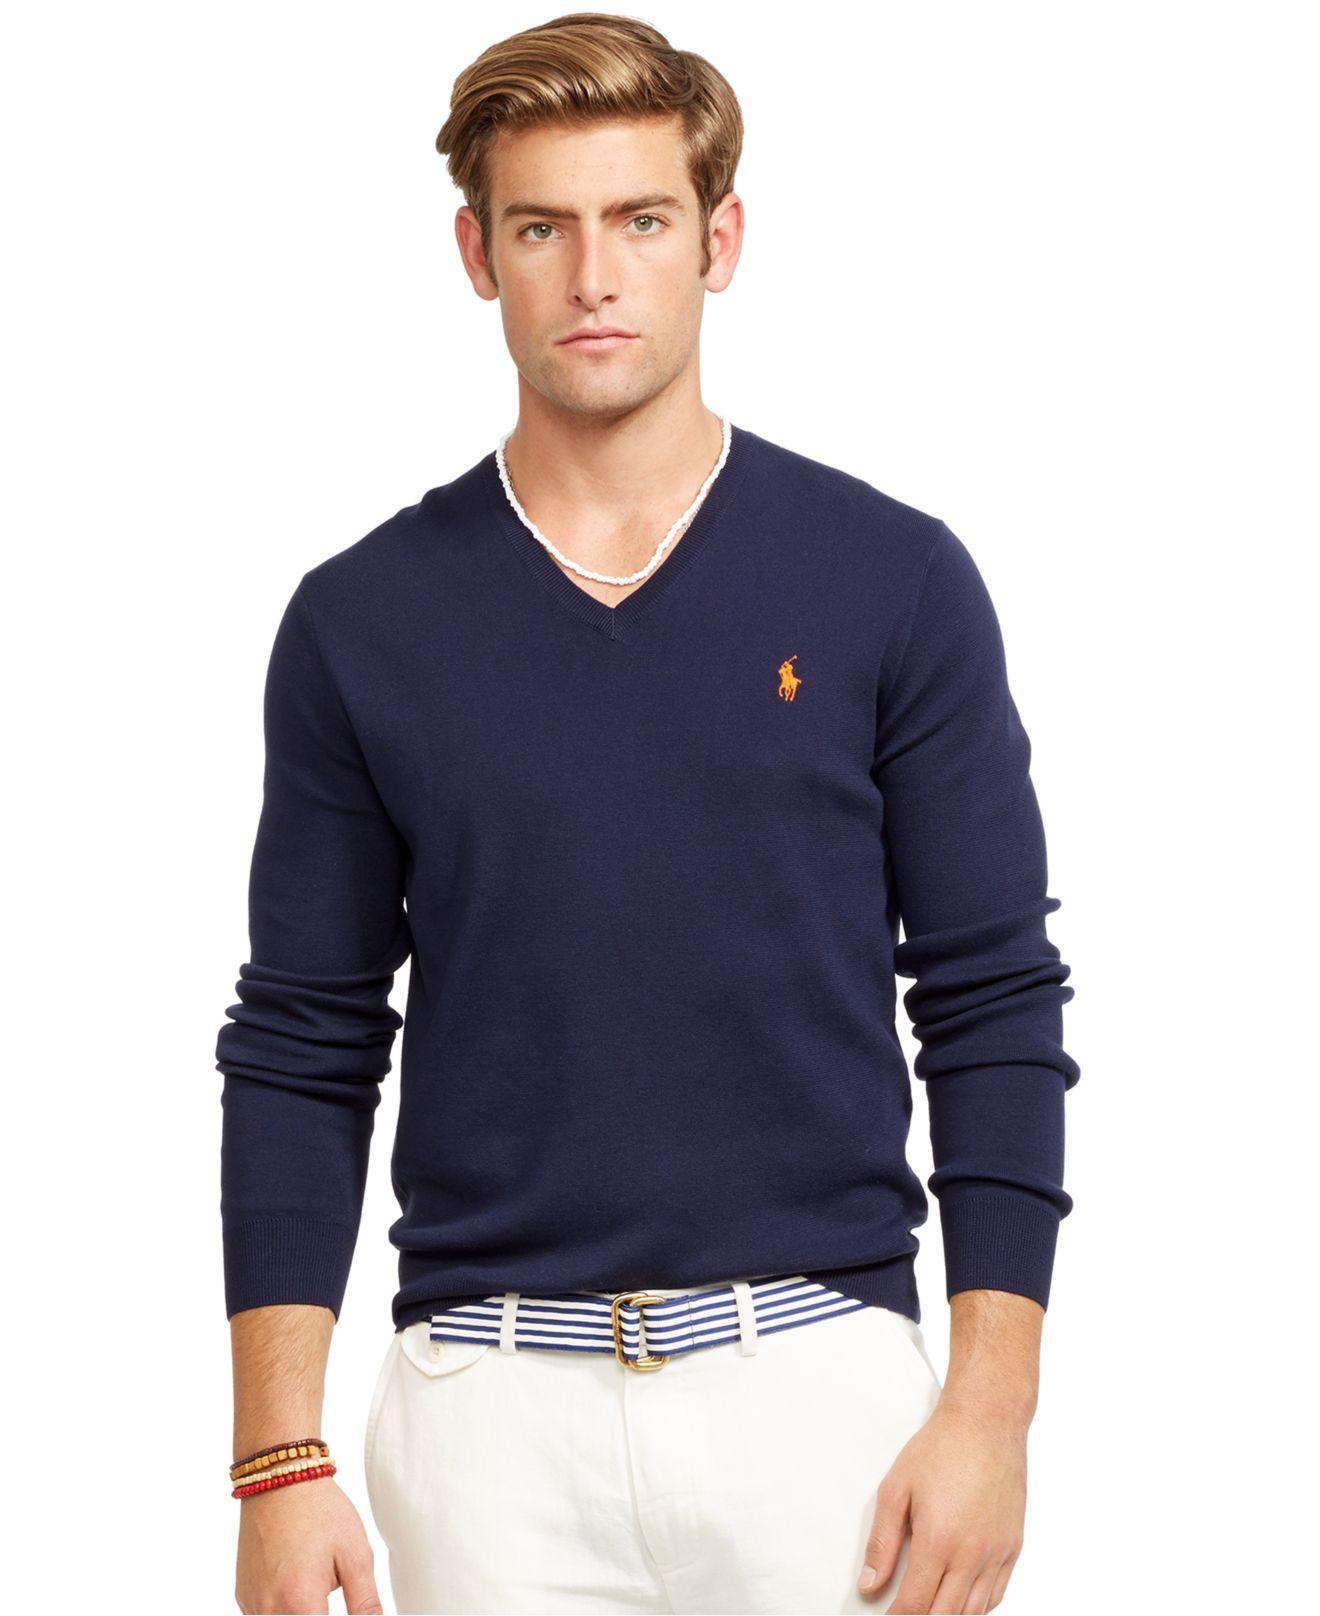 f1c3e069b6a0 Lyst - Polo Ralph Lauren V-neck Sweater in Blue for Men